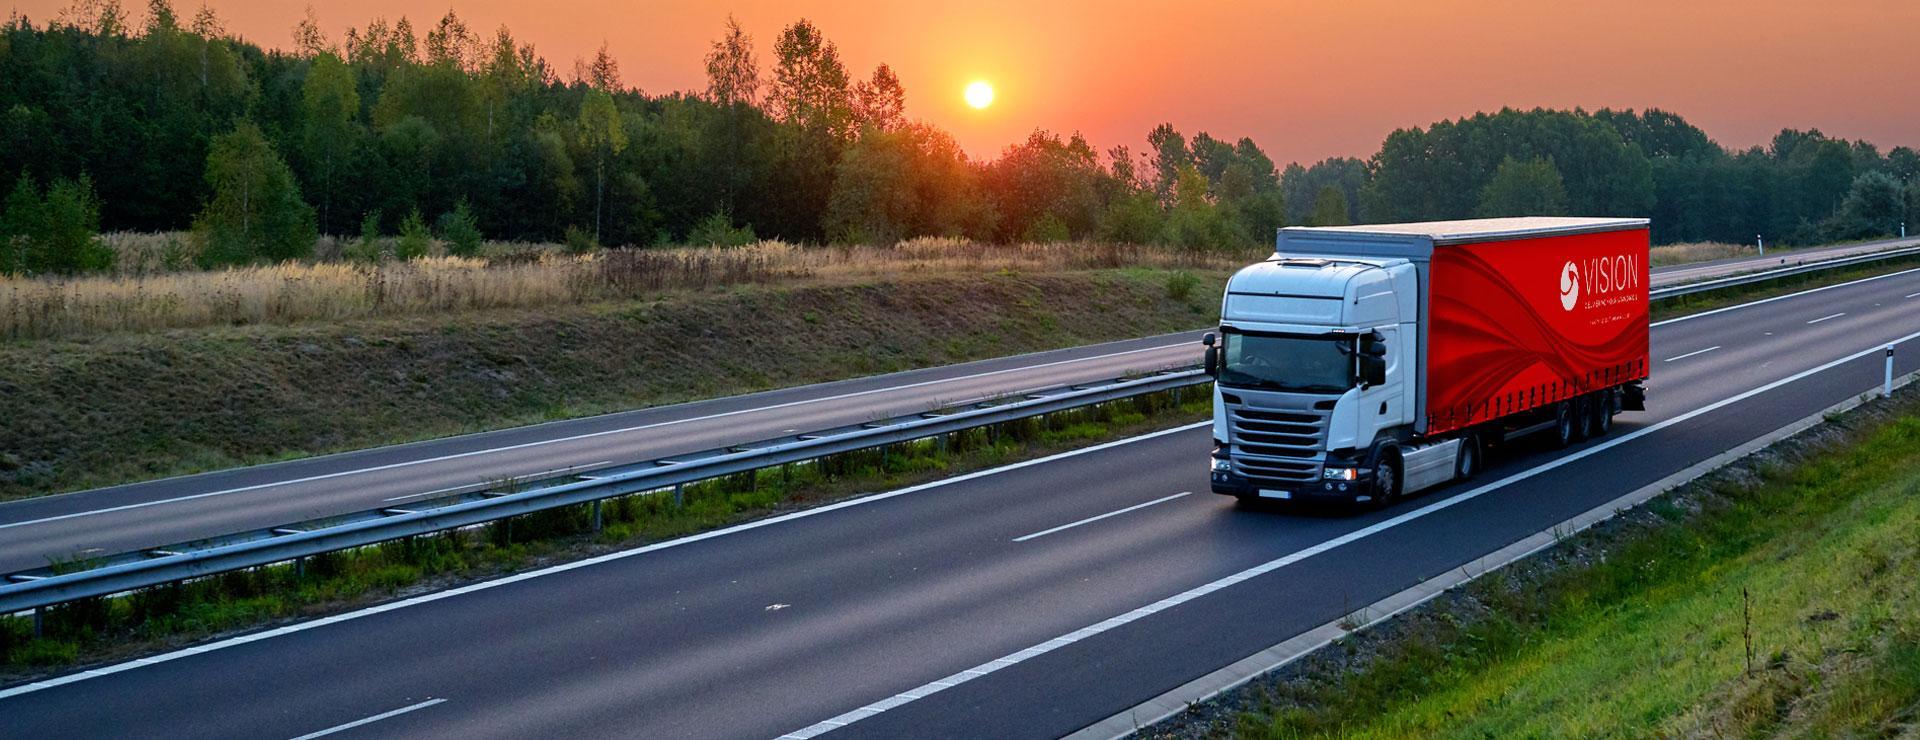 Truck transporting goods on motoroway